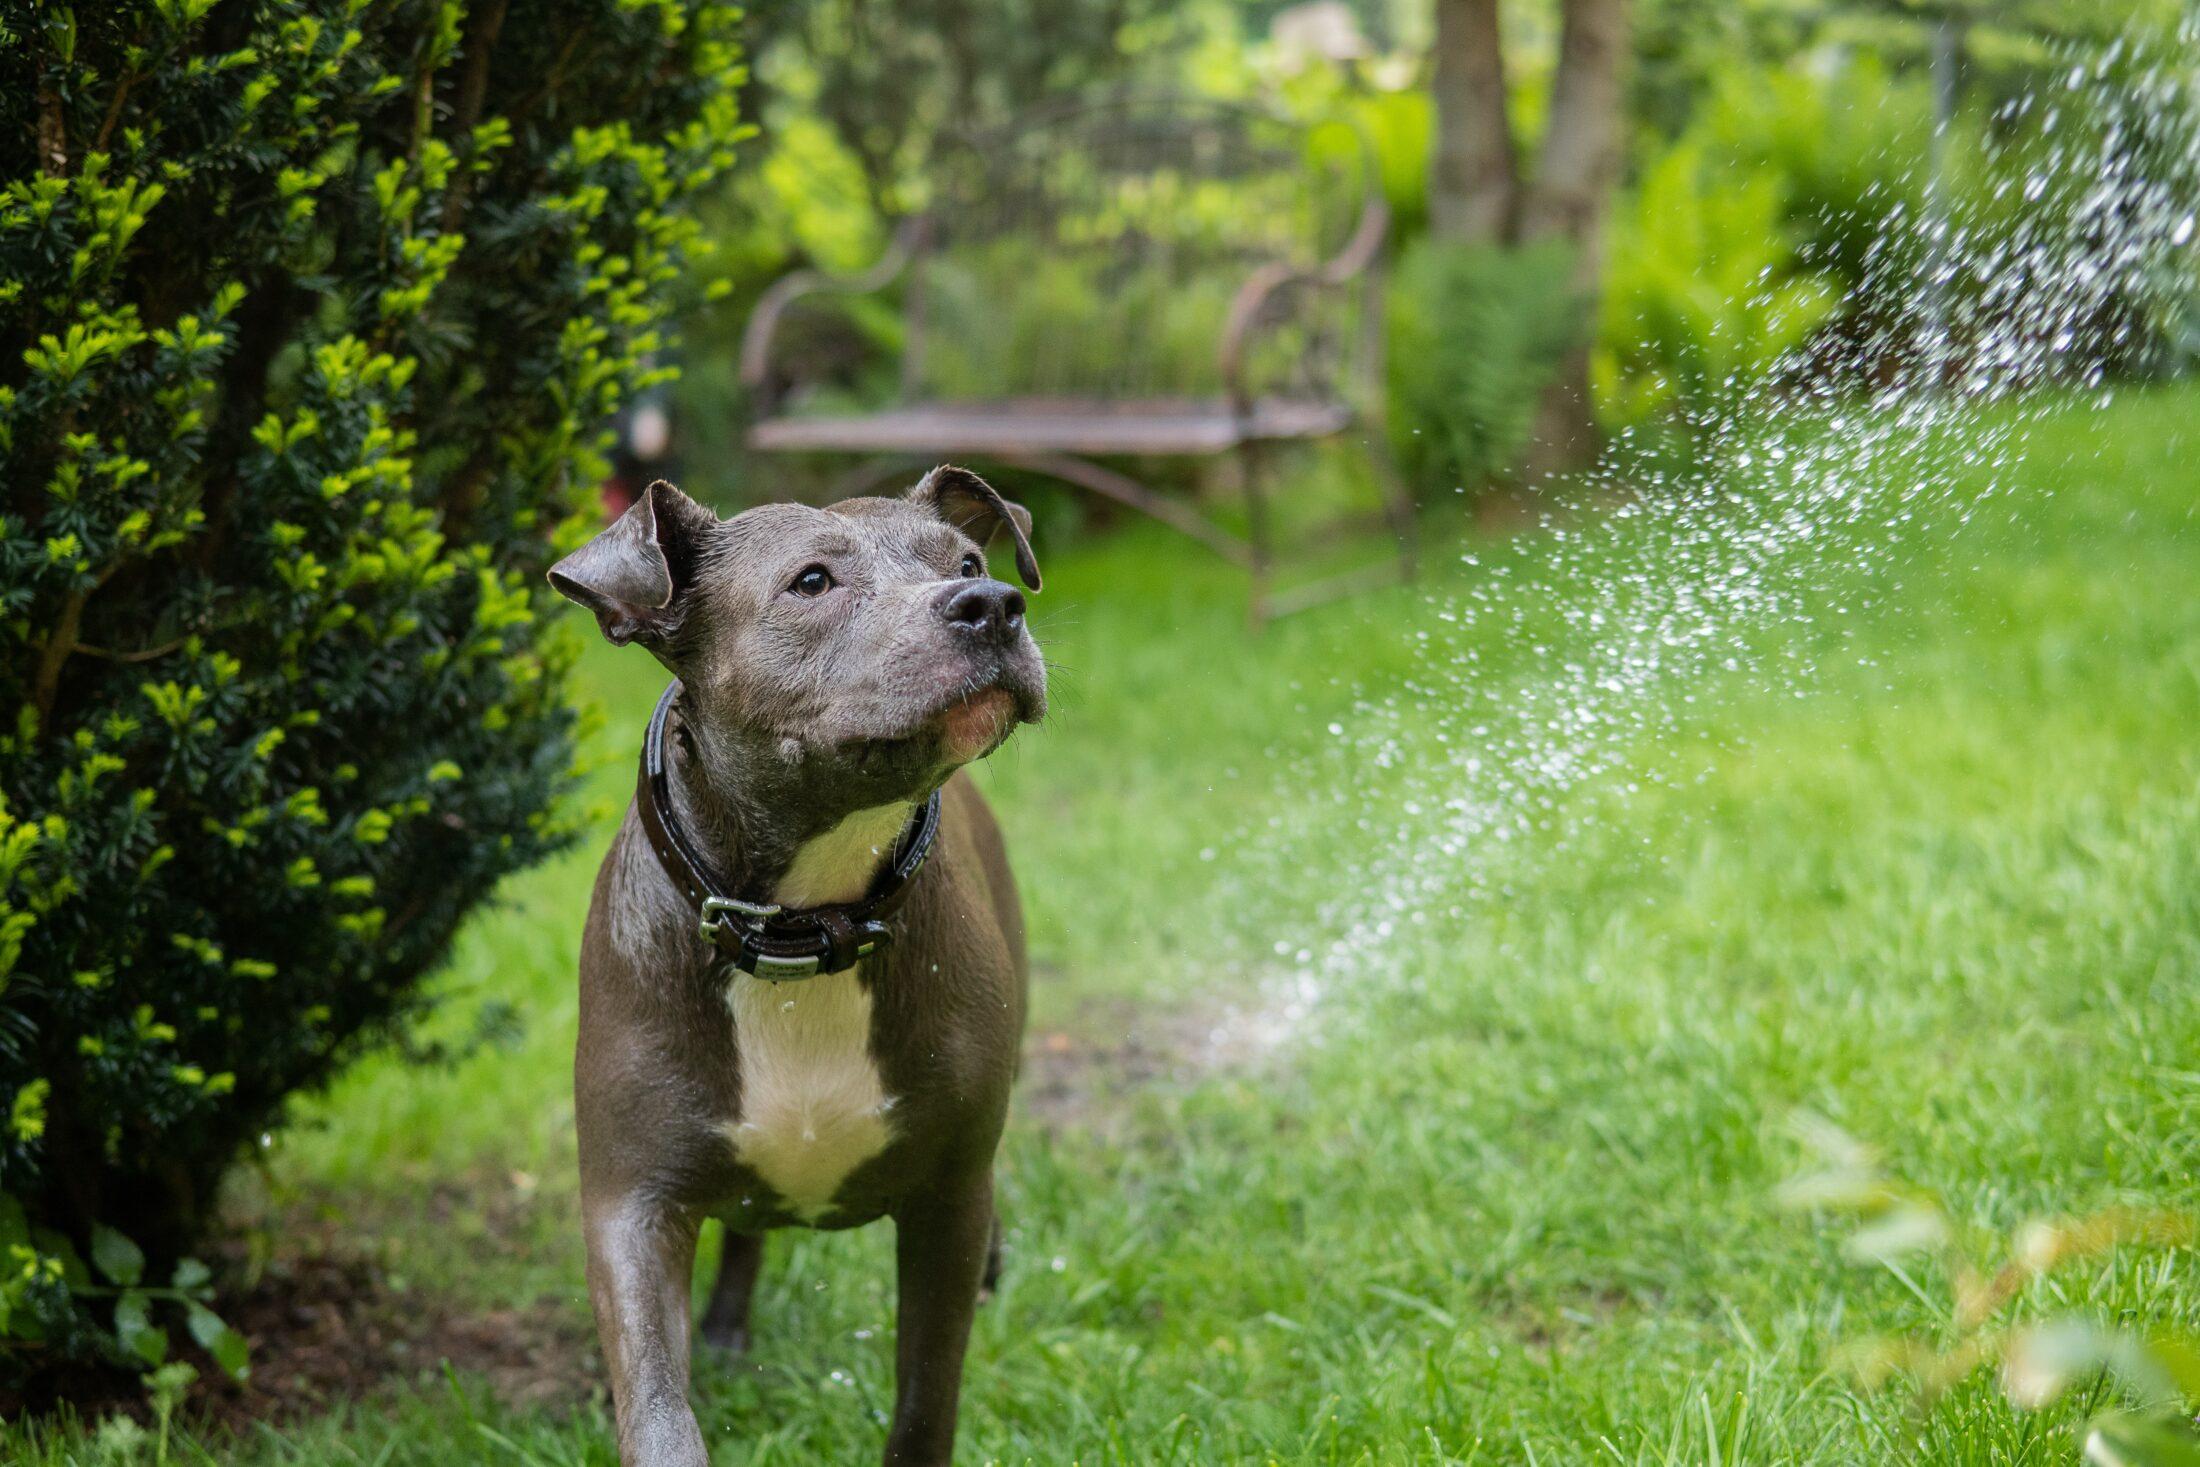 cachorro porte médio: staff terrier americano